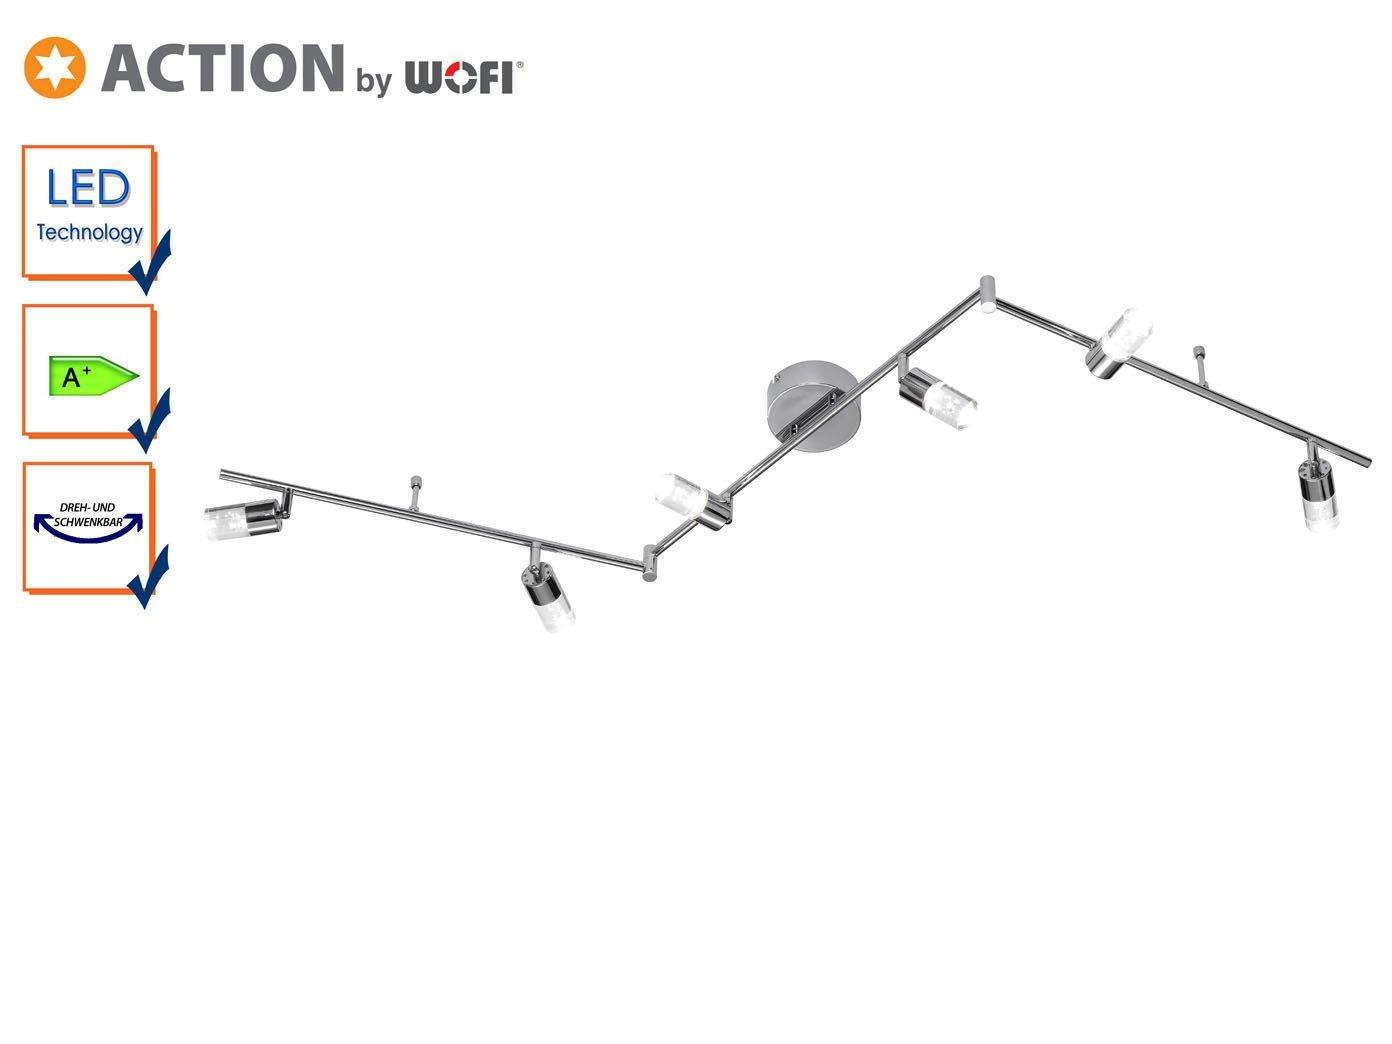 Action vigas, 6-lámpara de techo aluminio 6 x LED/5 W, 9 x 20, 5 x 194 cm, 3000 K, 400 lm, eficiencia energética de clase a vigas +, 6-lámpara de techo ...